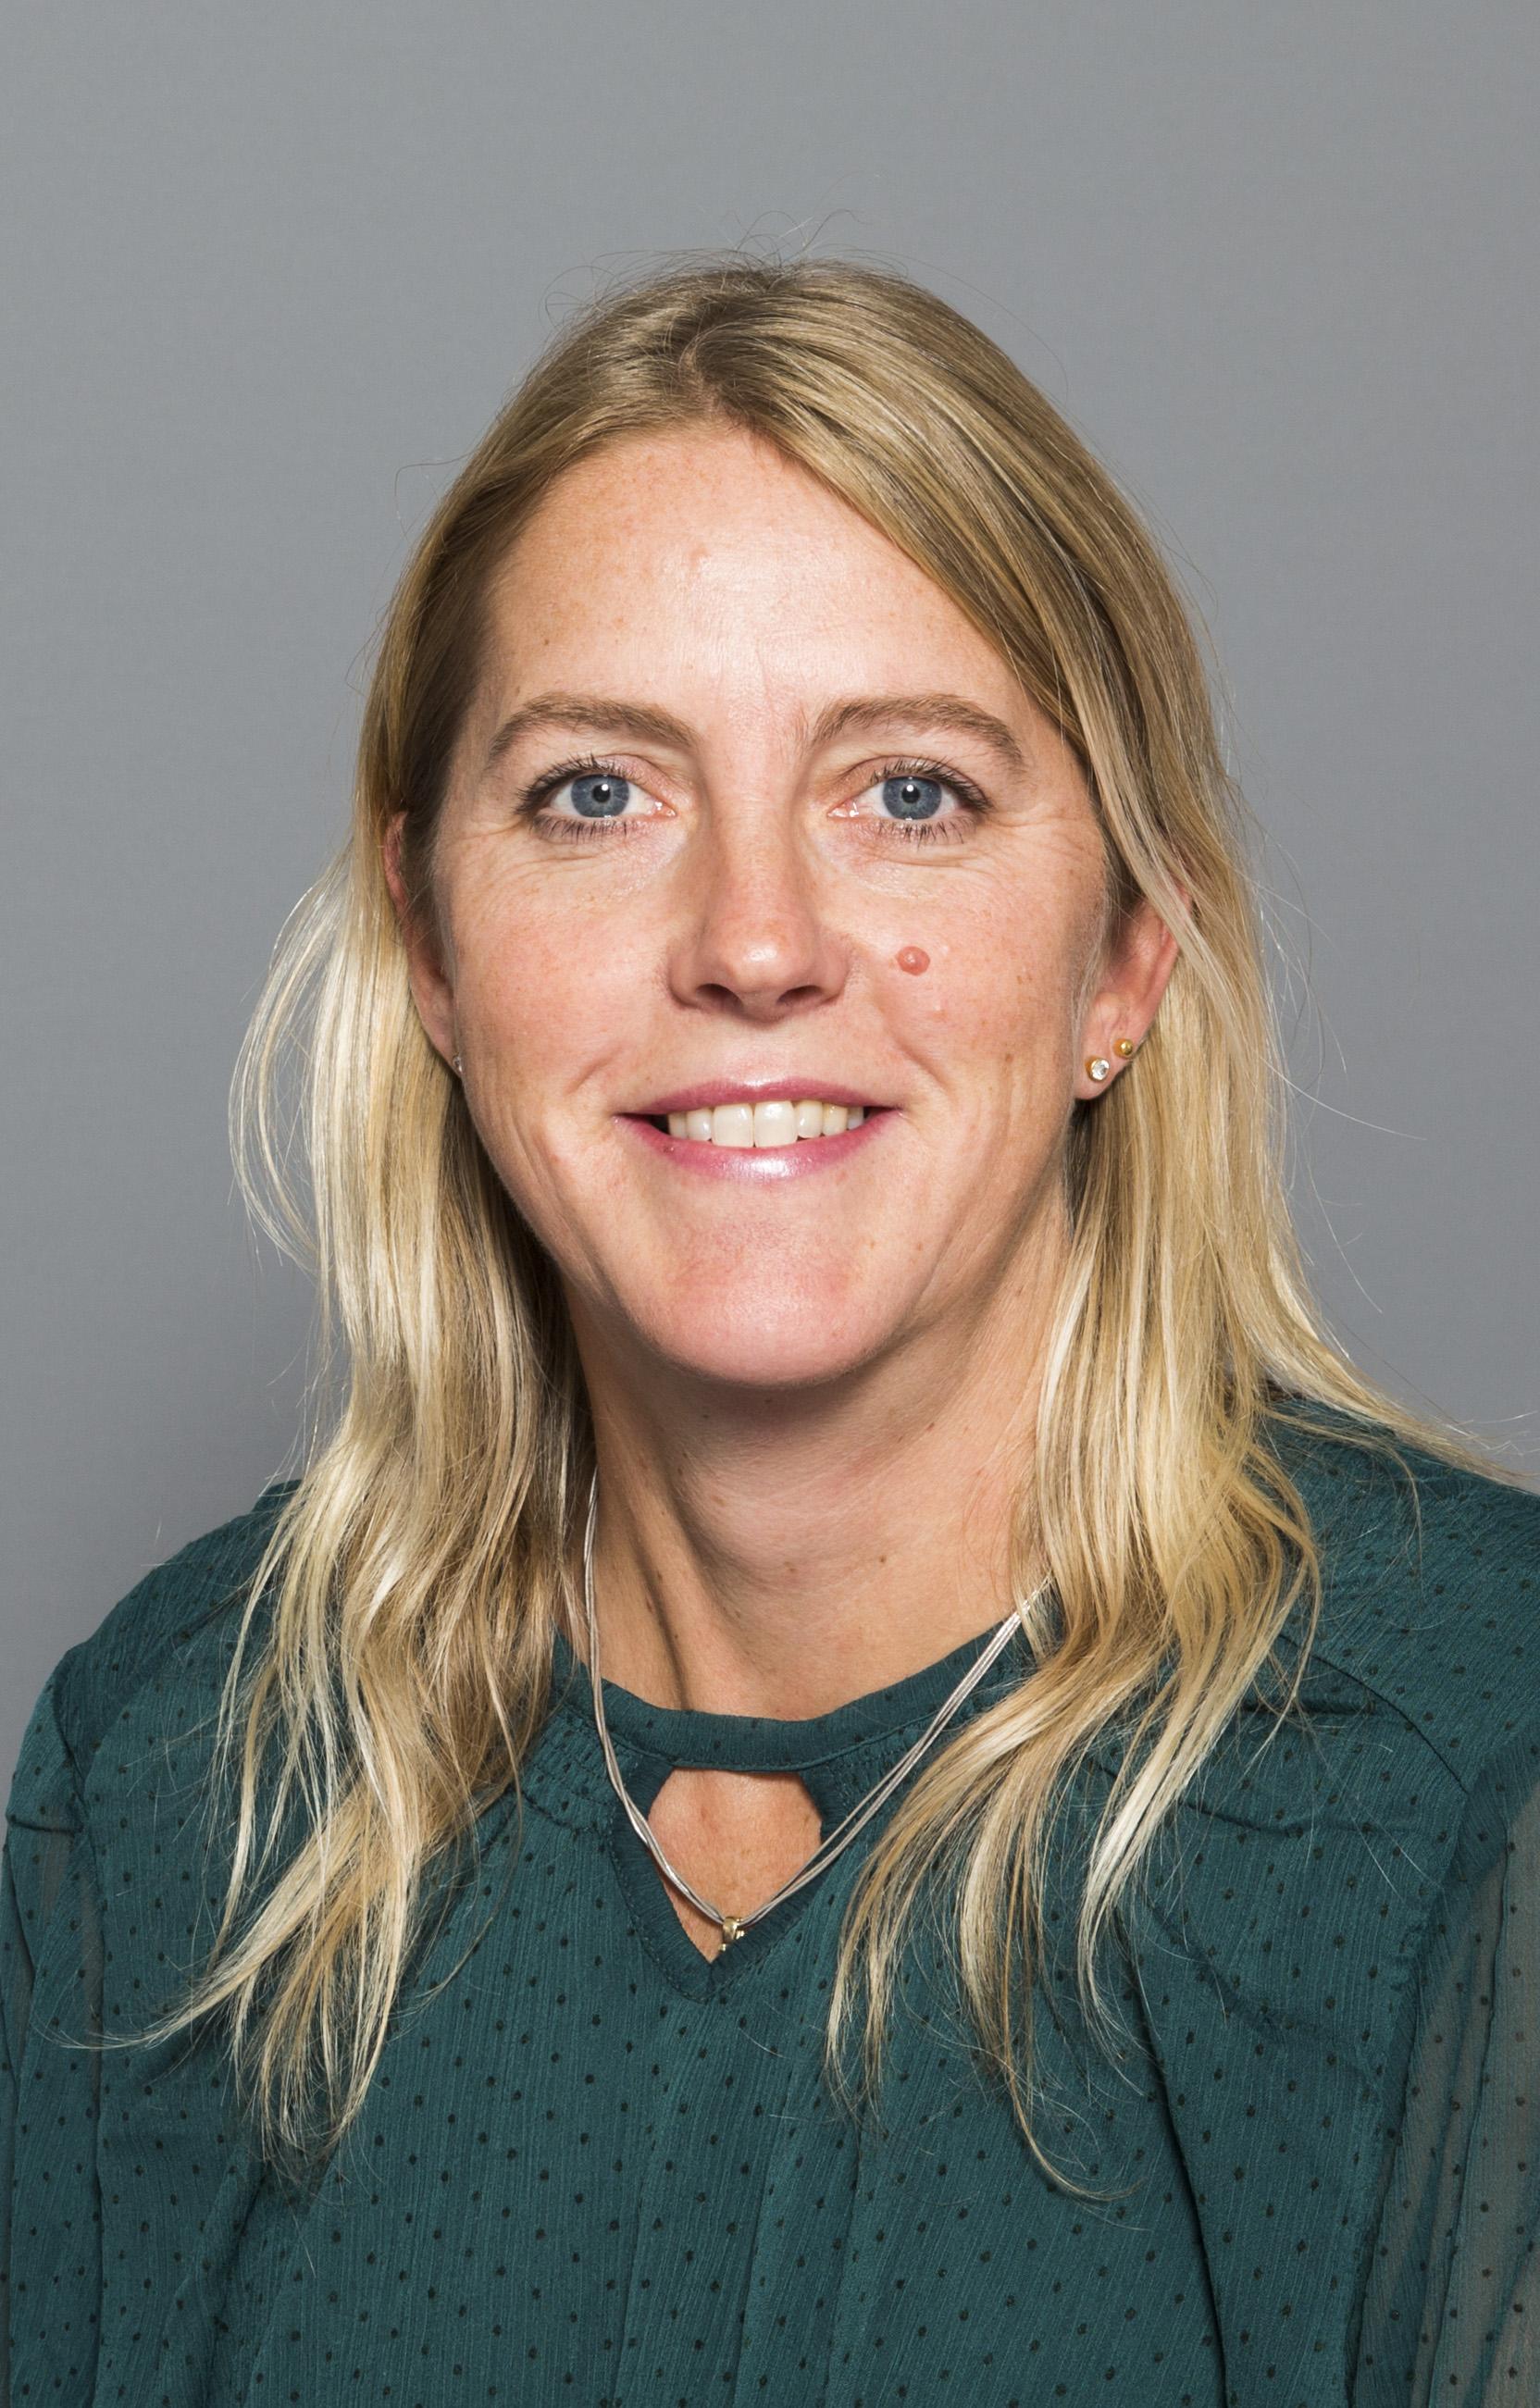 Charlotte Dahl Schiødt